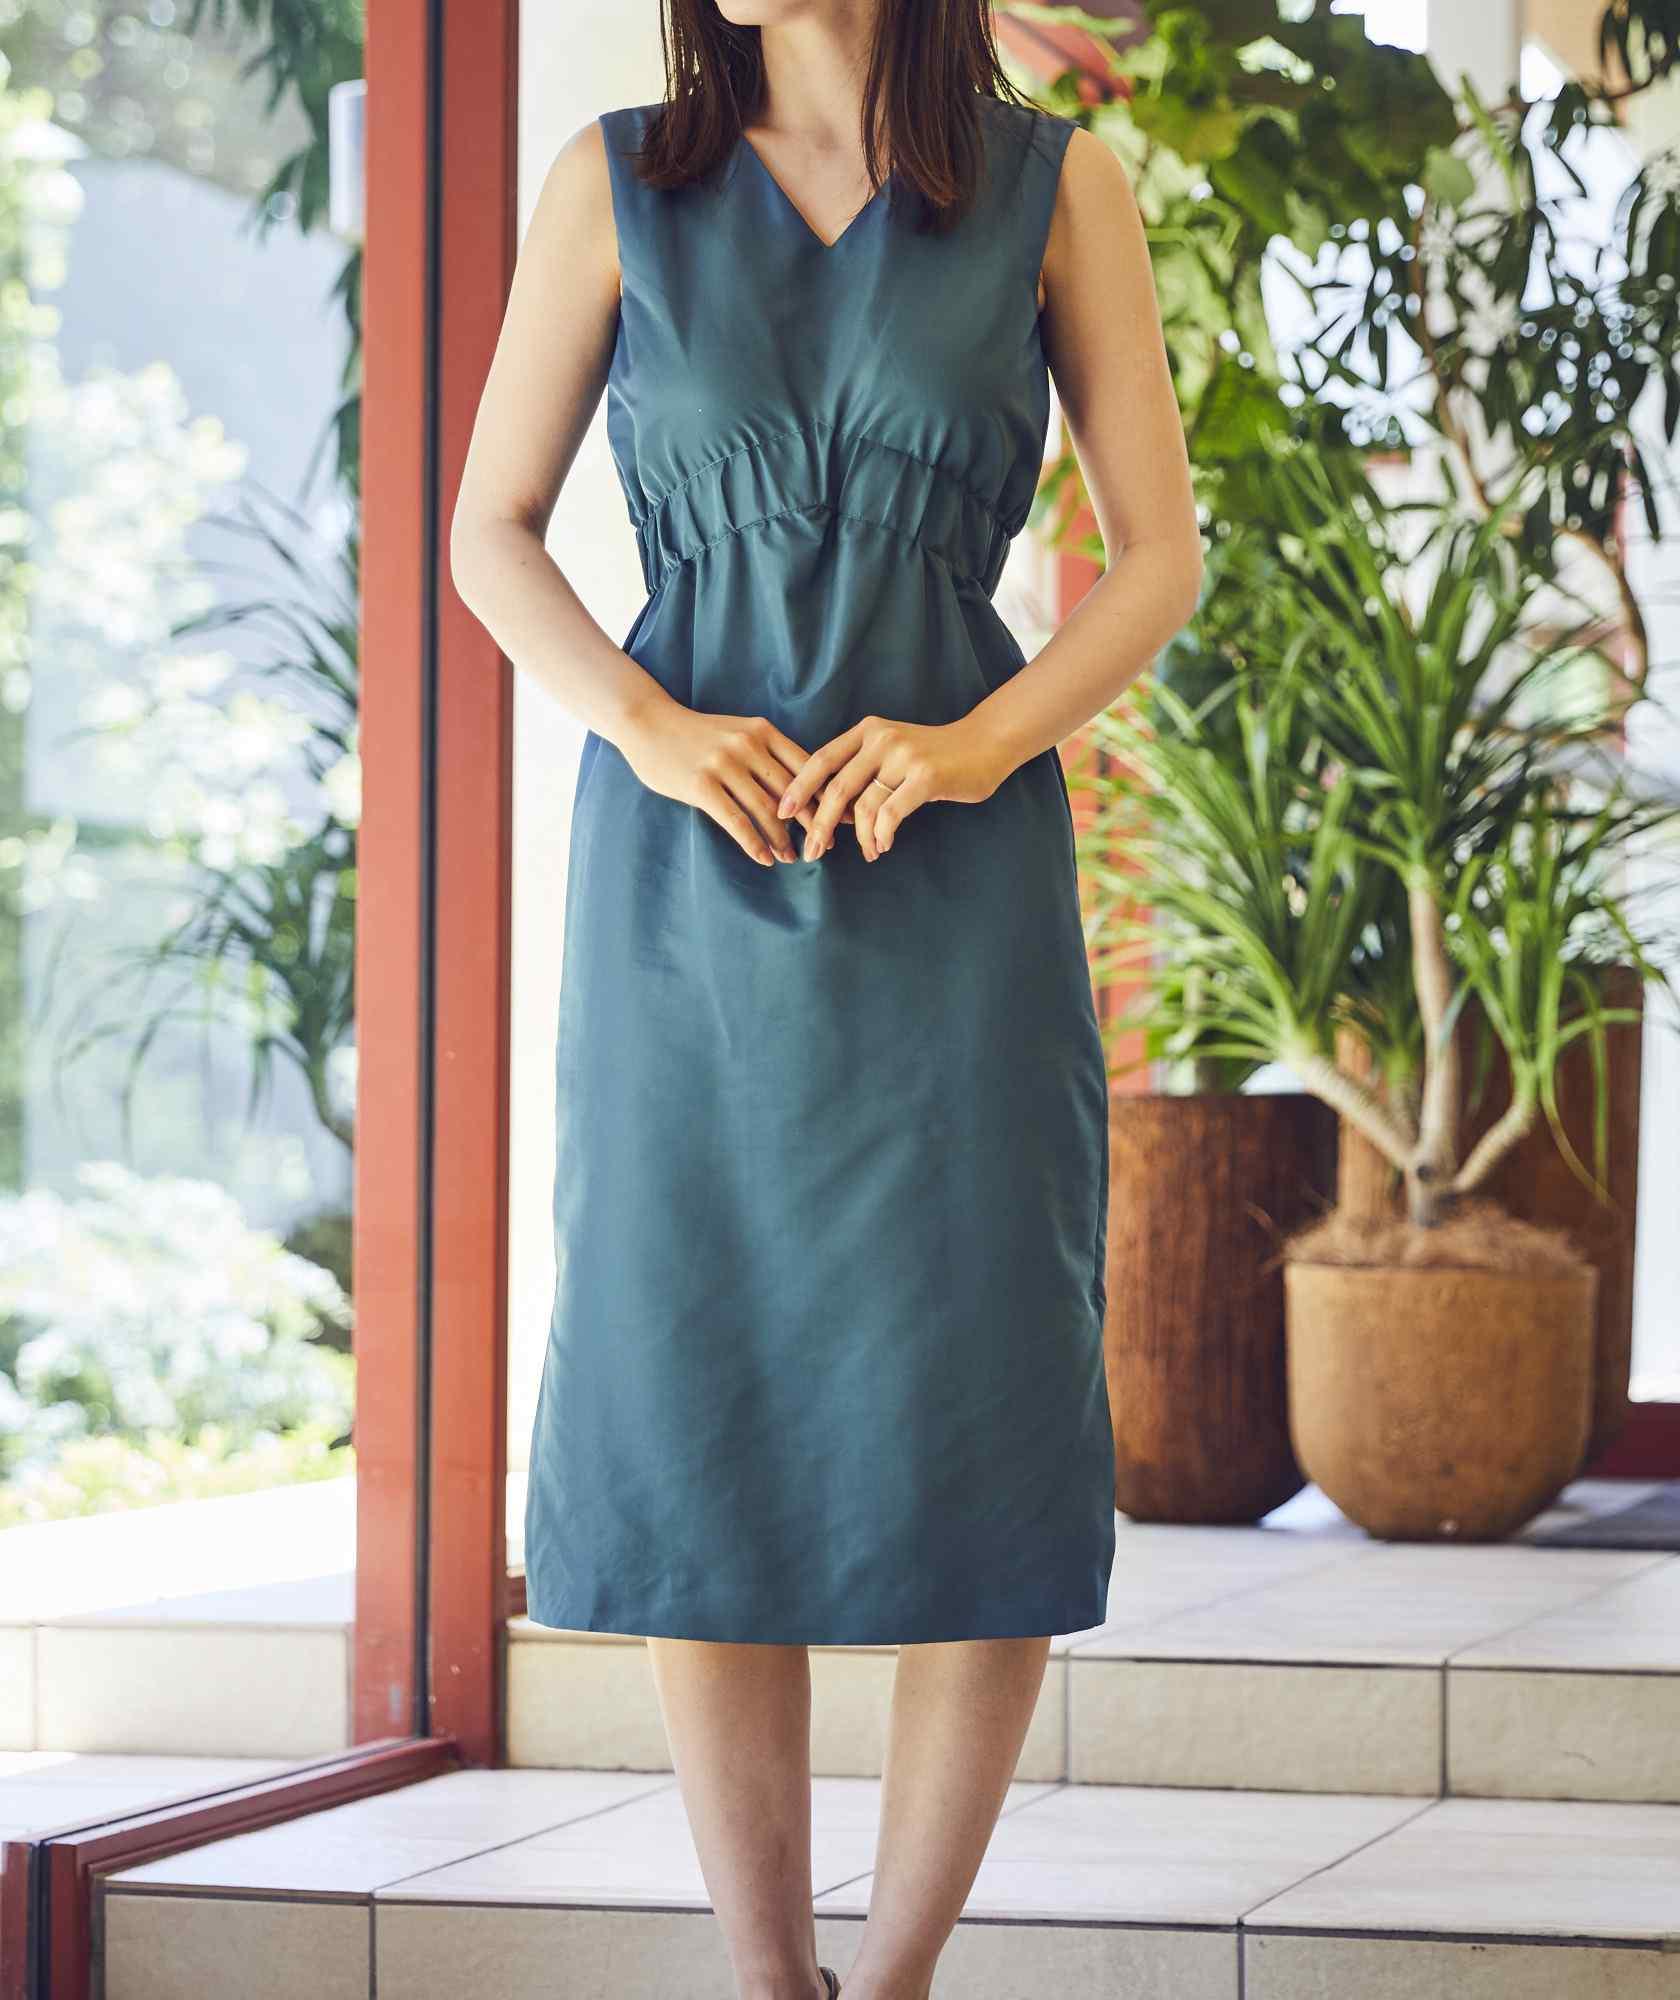 VネックシャーリングOGタイトミディアムドレス-グリーン-M